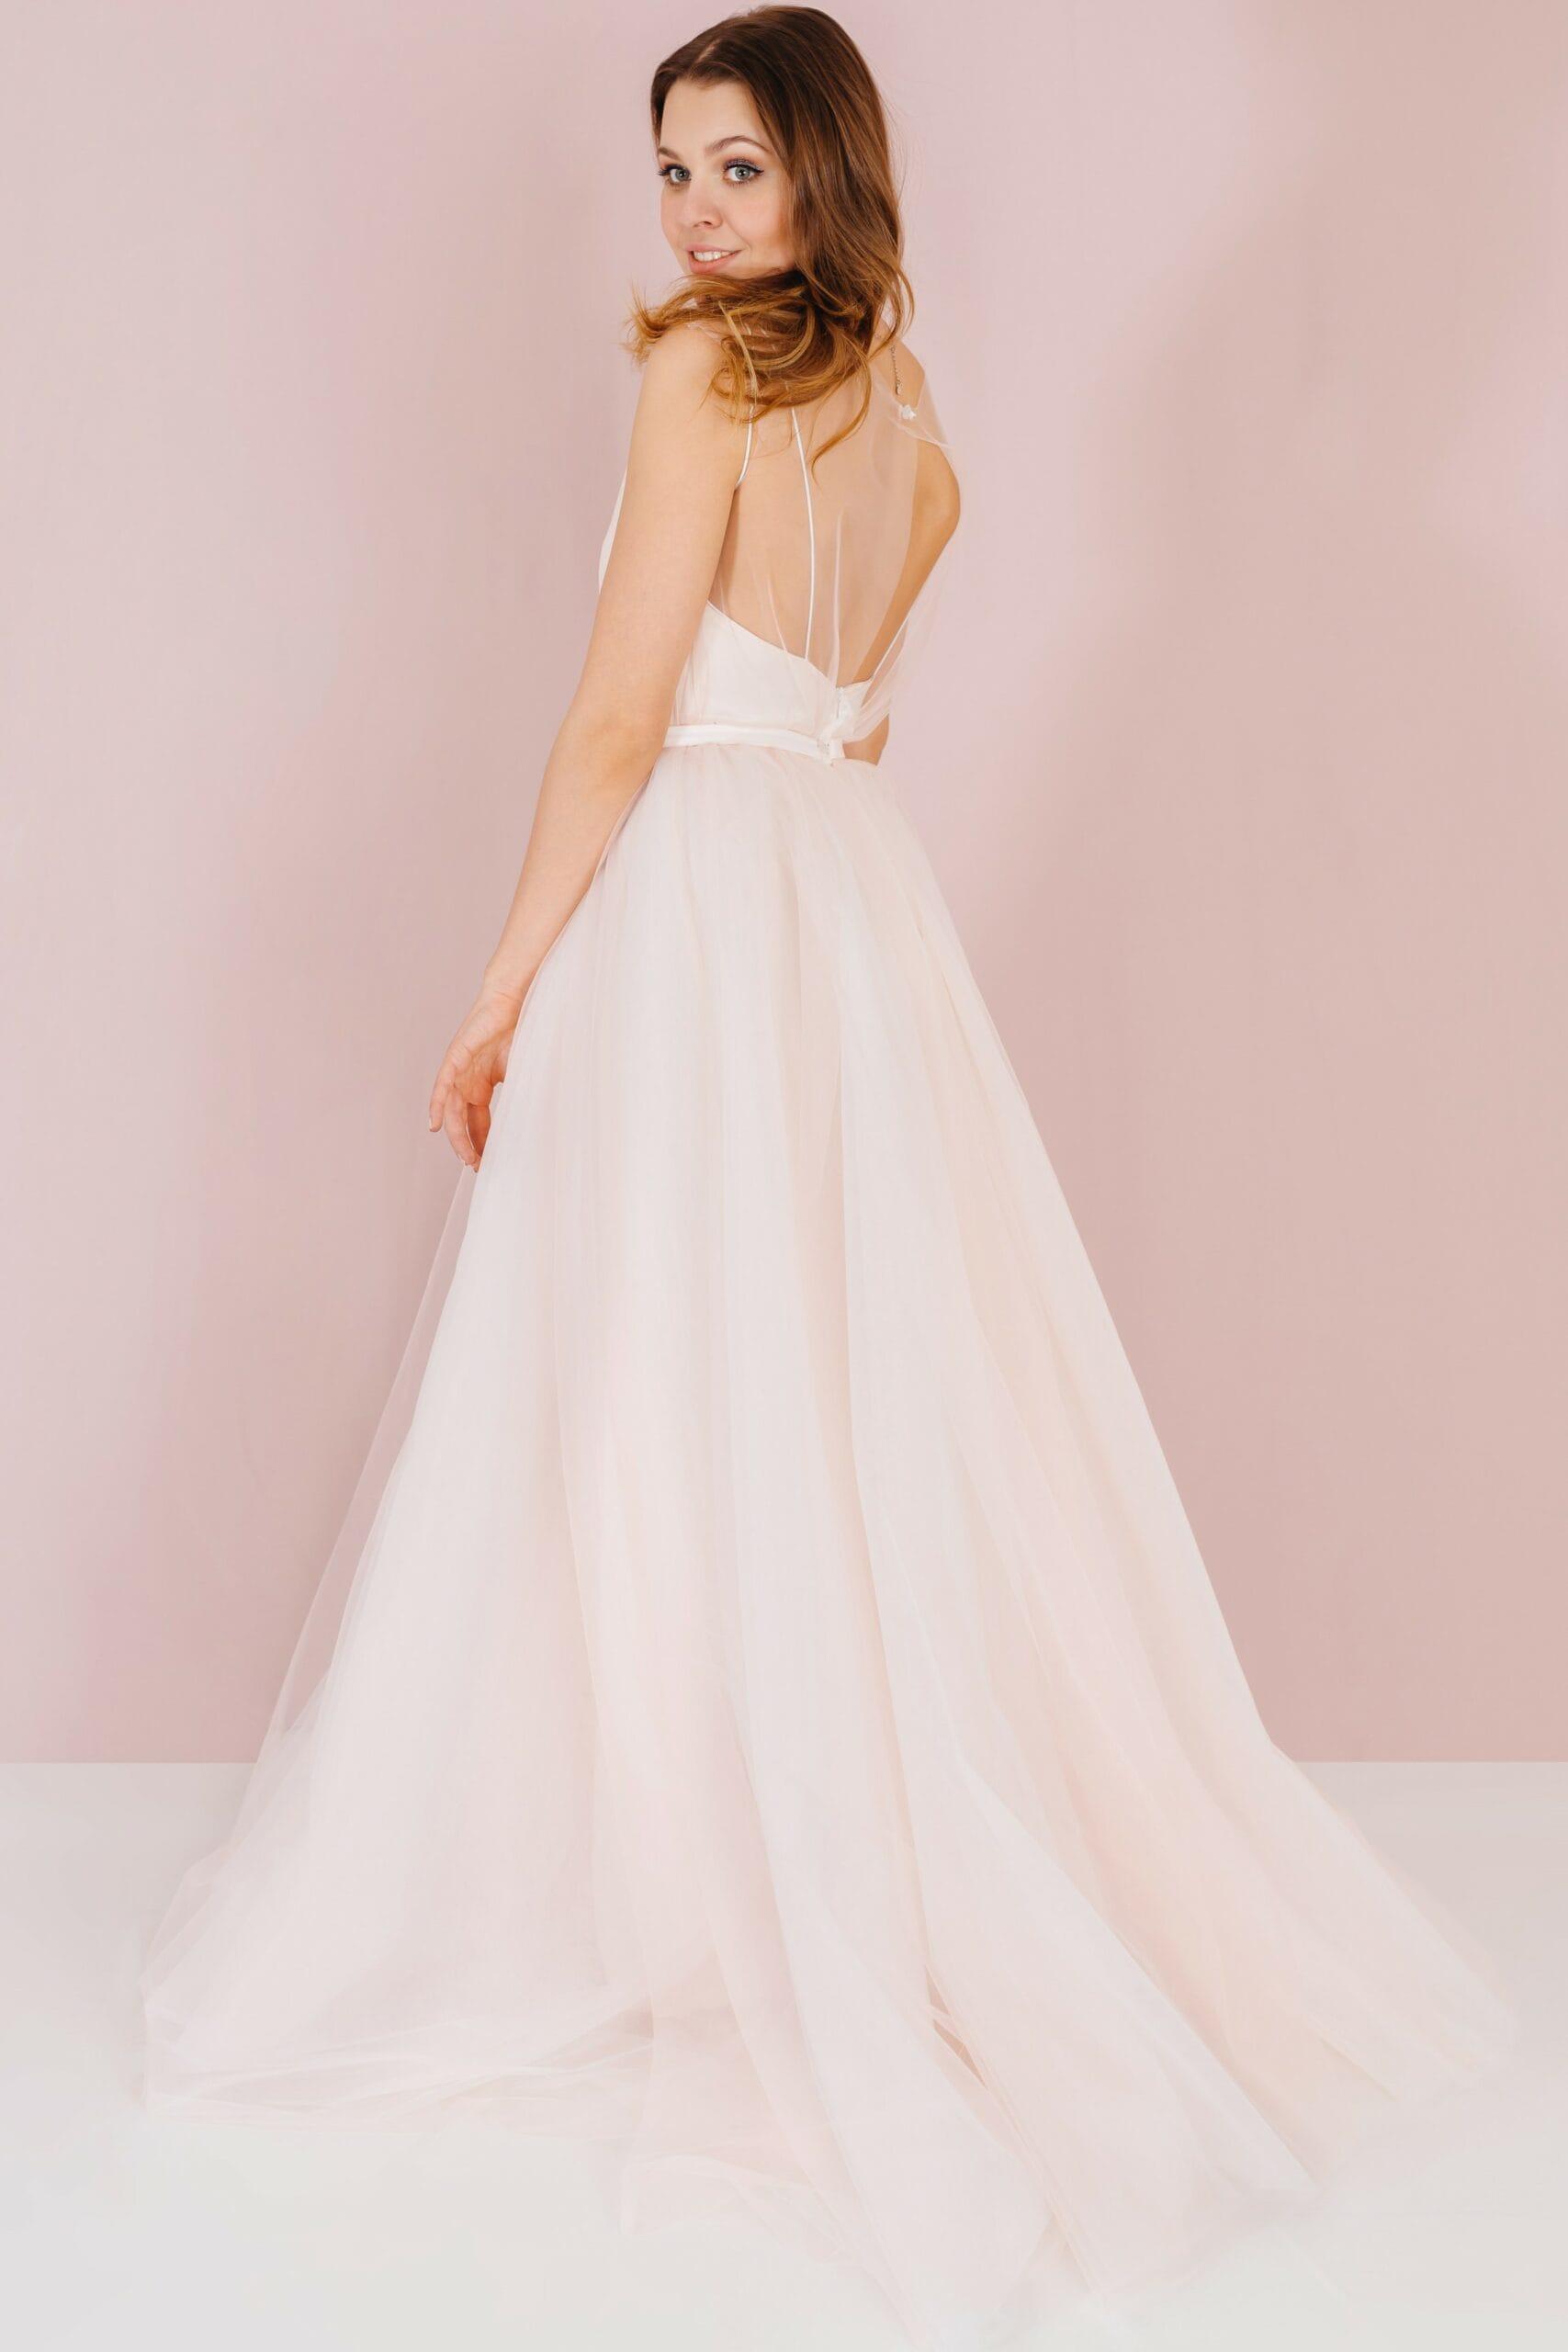 Свадебное платье HARMONY, коллекция LOFT, бренд RARE BRIDAL, фото 3